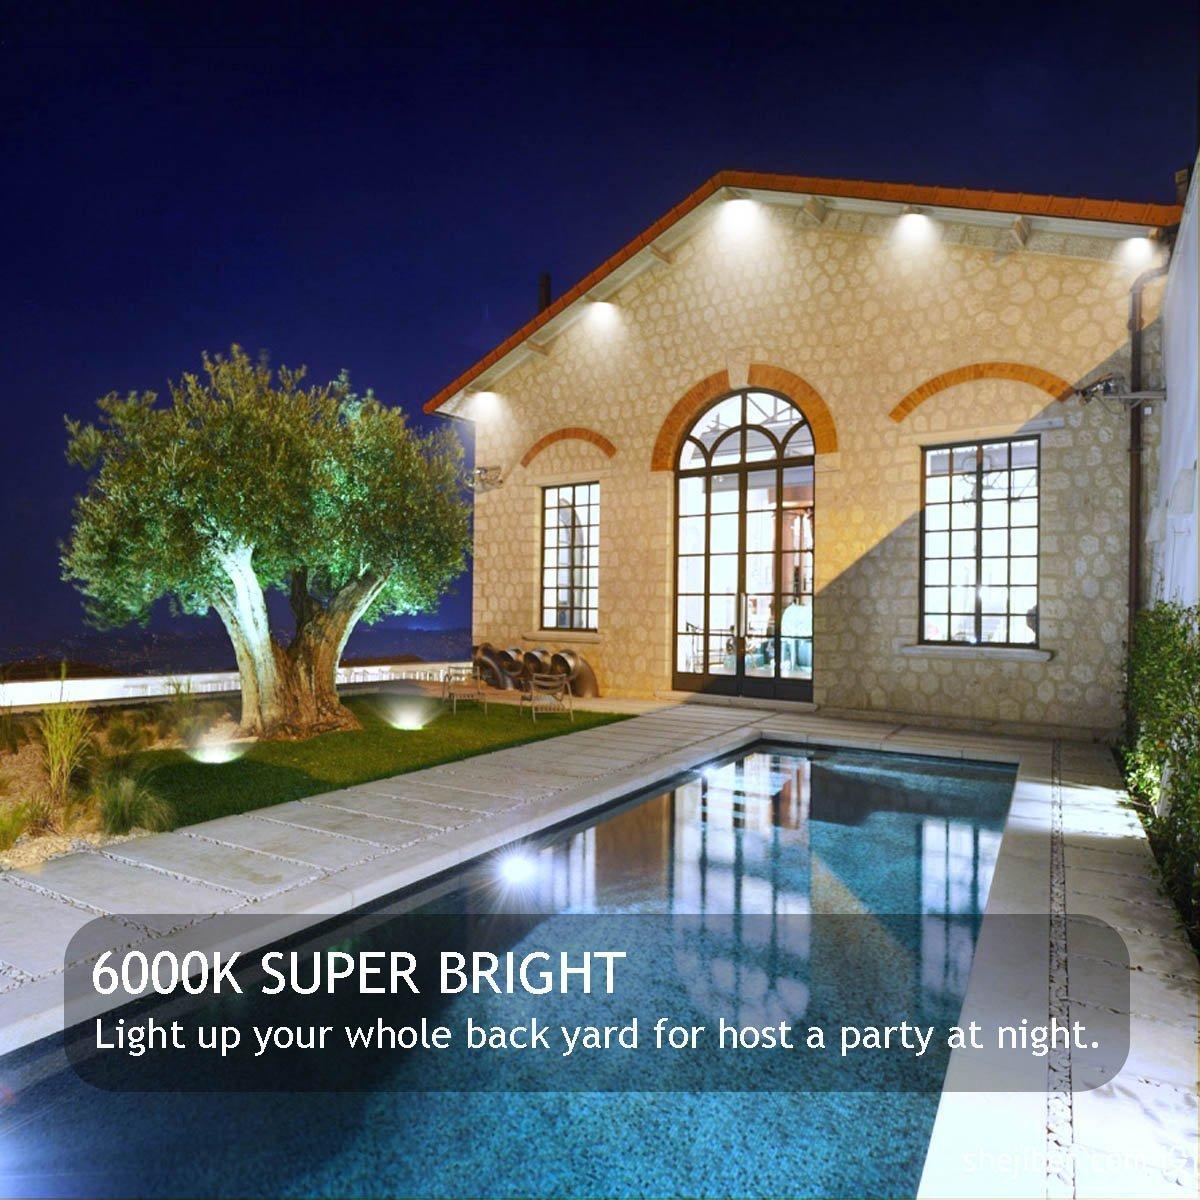 GLW 100W LED Outdoor Flood Light Super Bright,9000lm,6000K,110V,250W HPS Bulb Equivalent,Waterproof IP65 Security Work Light,US 3 Prong Plug